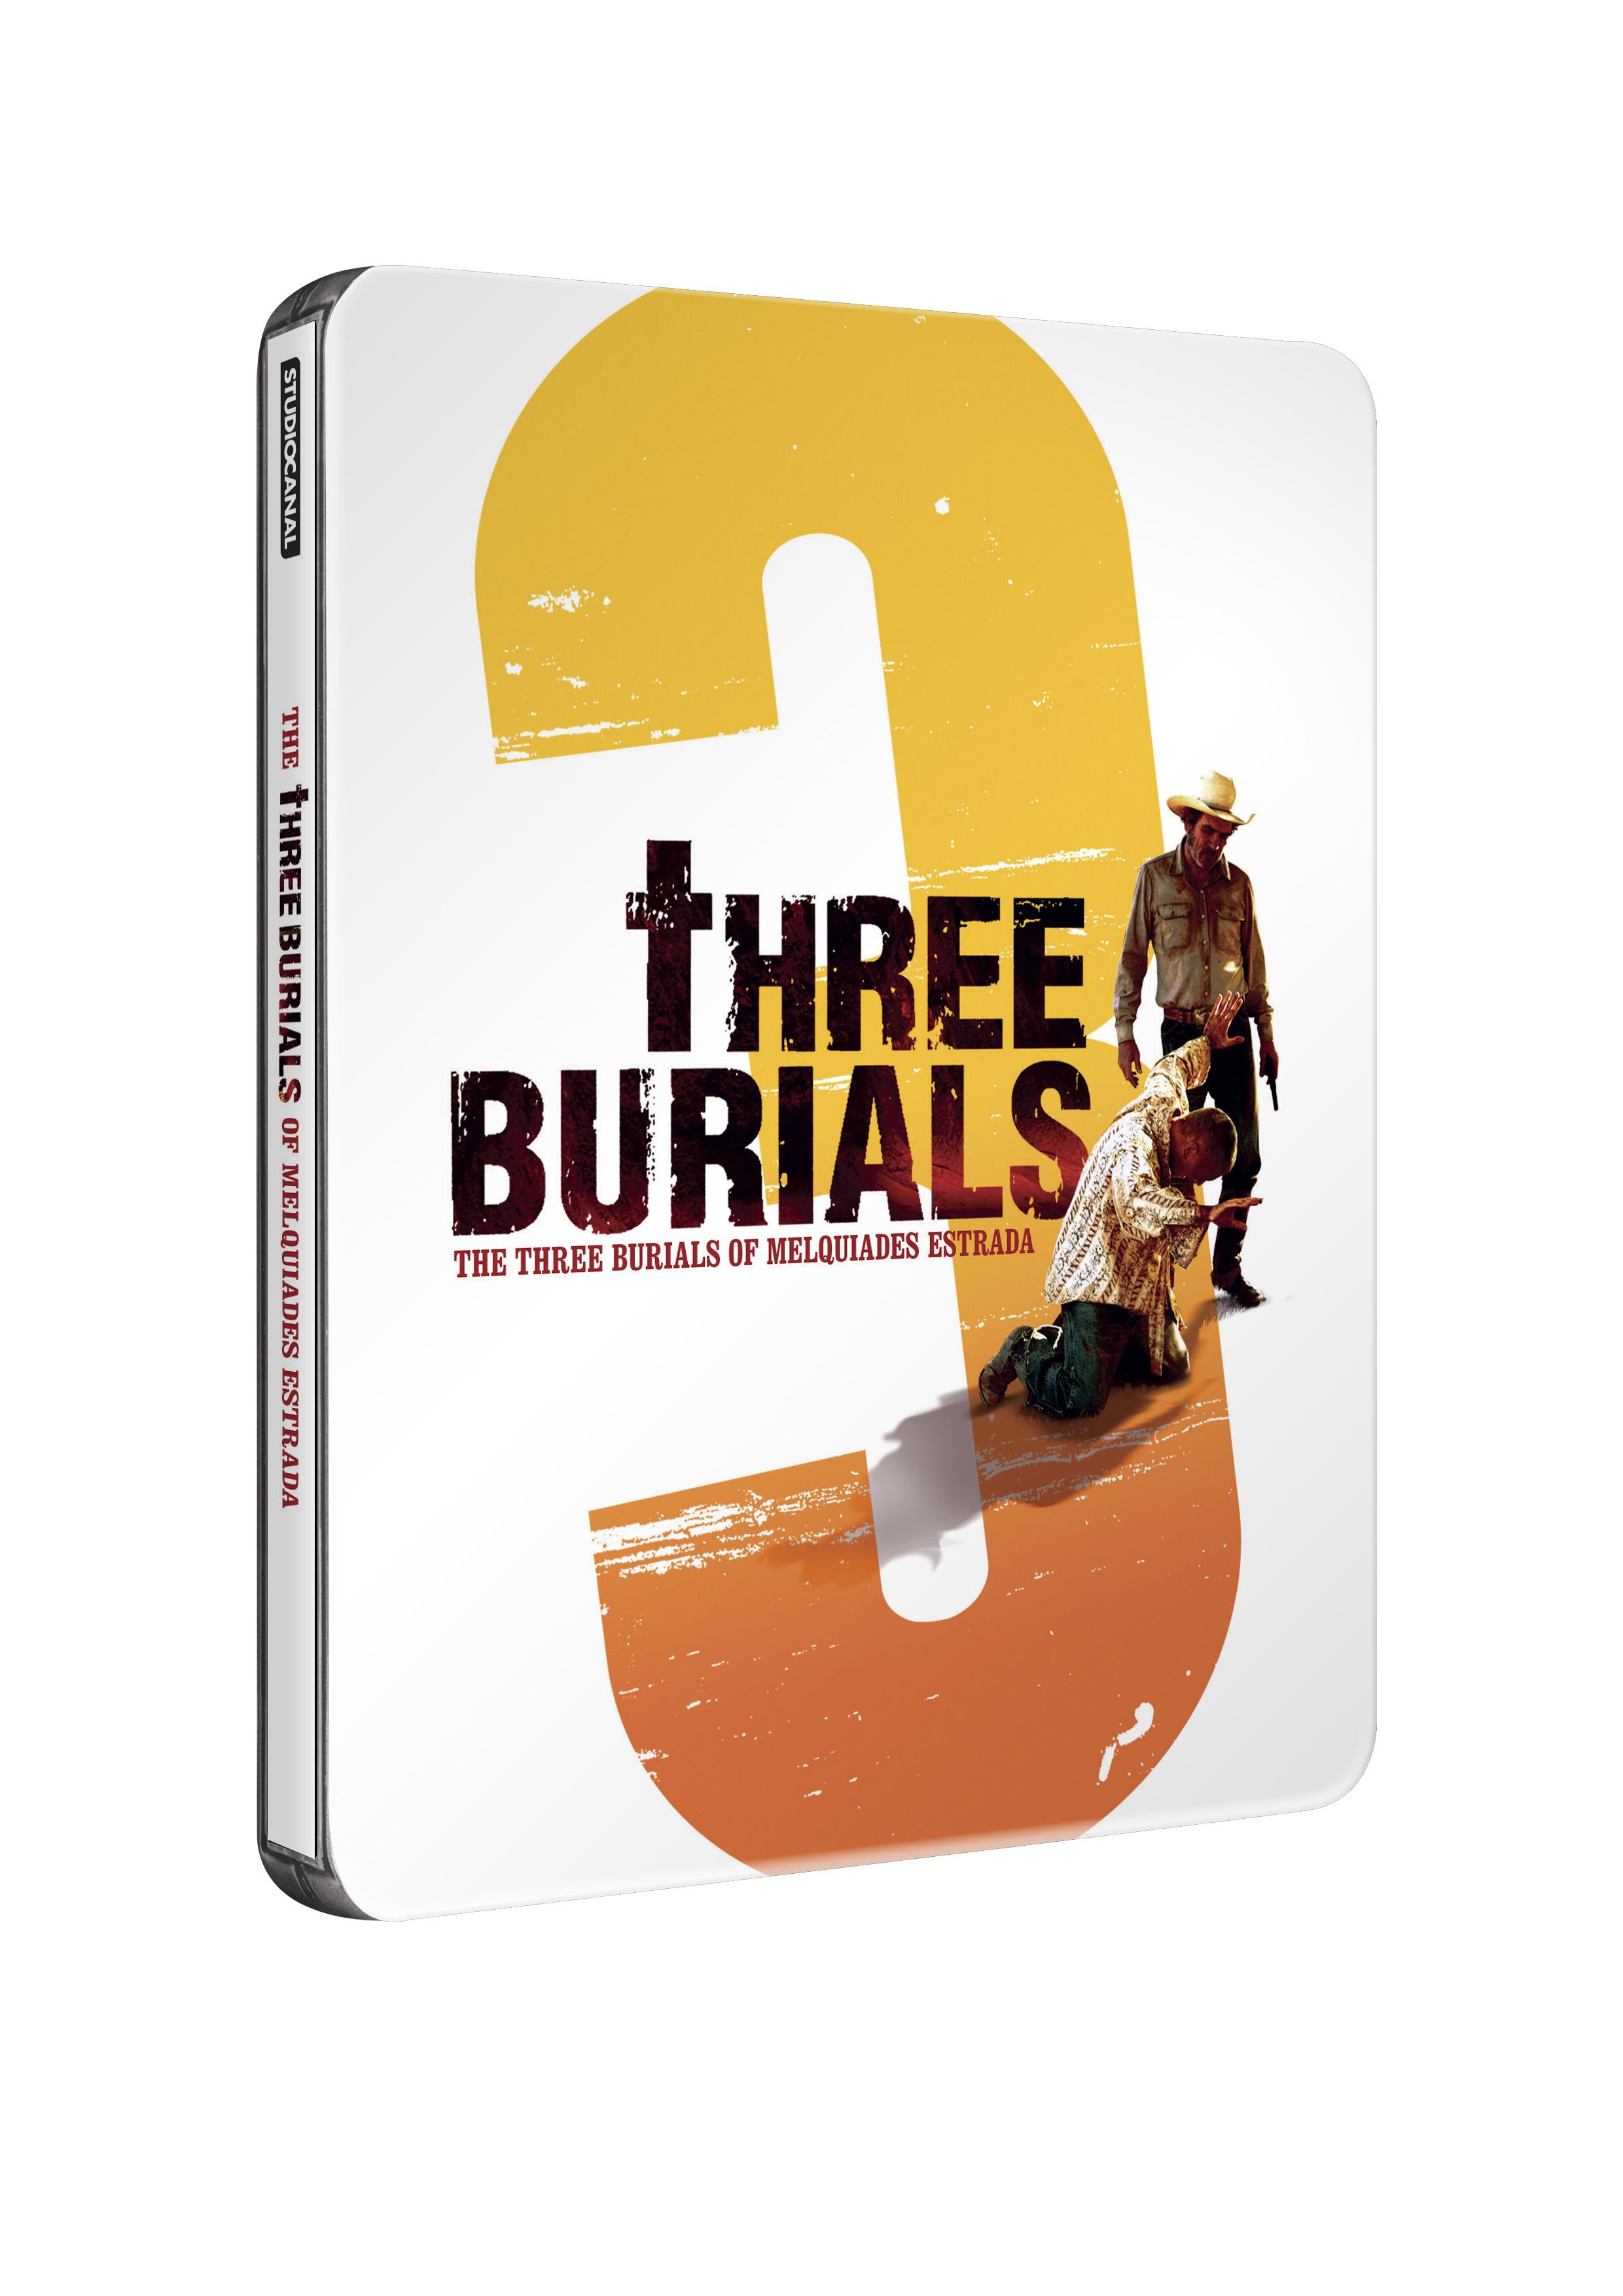 3BURIALS_3D.jpg